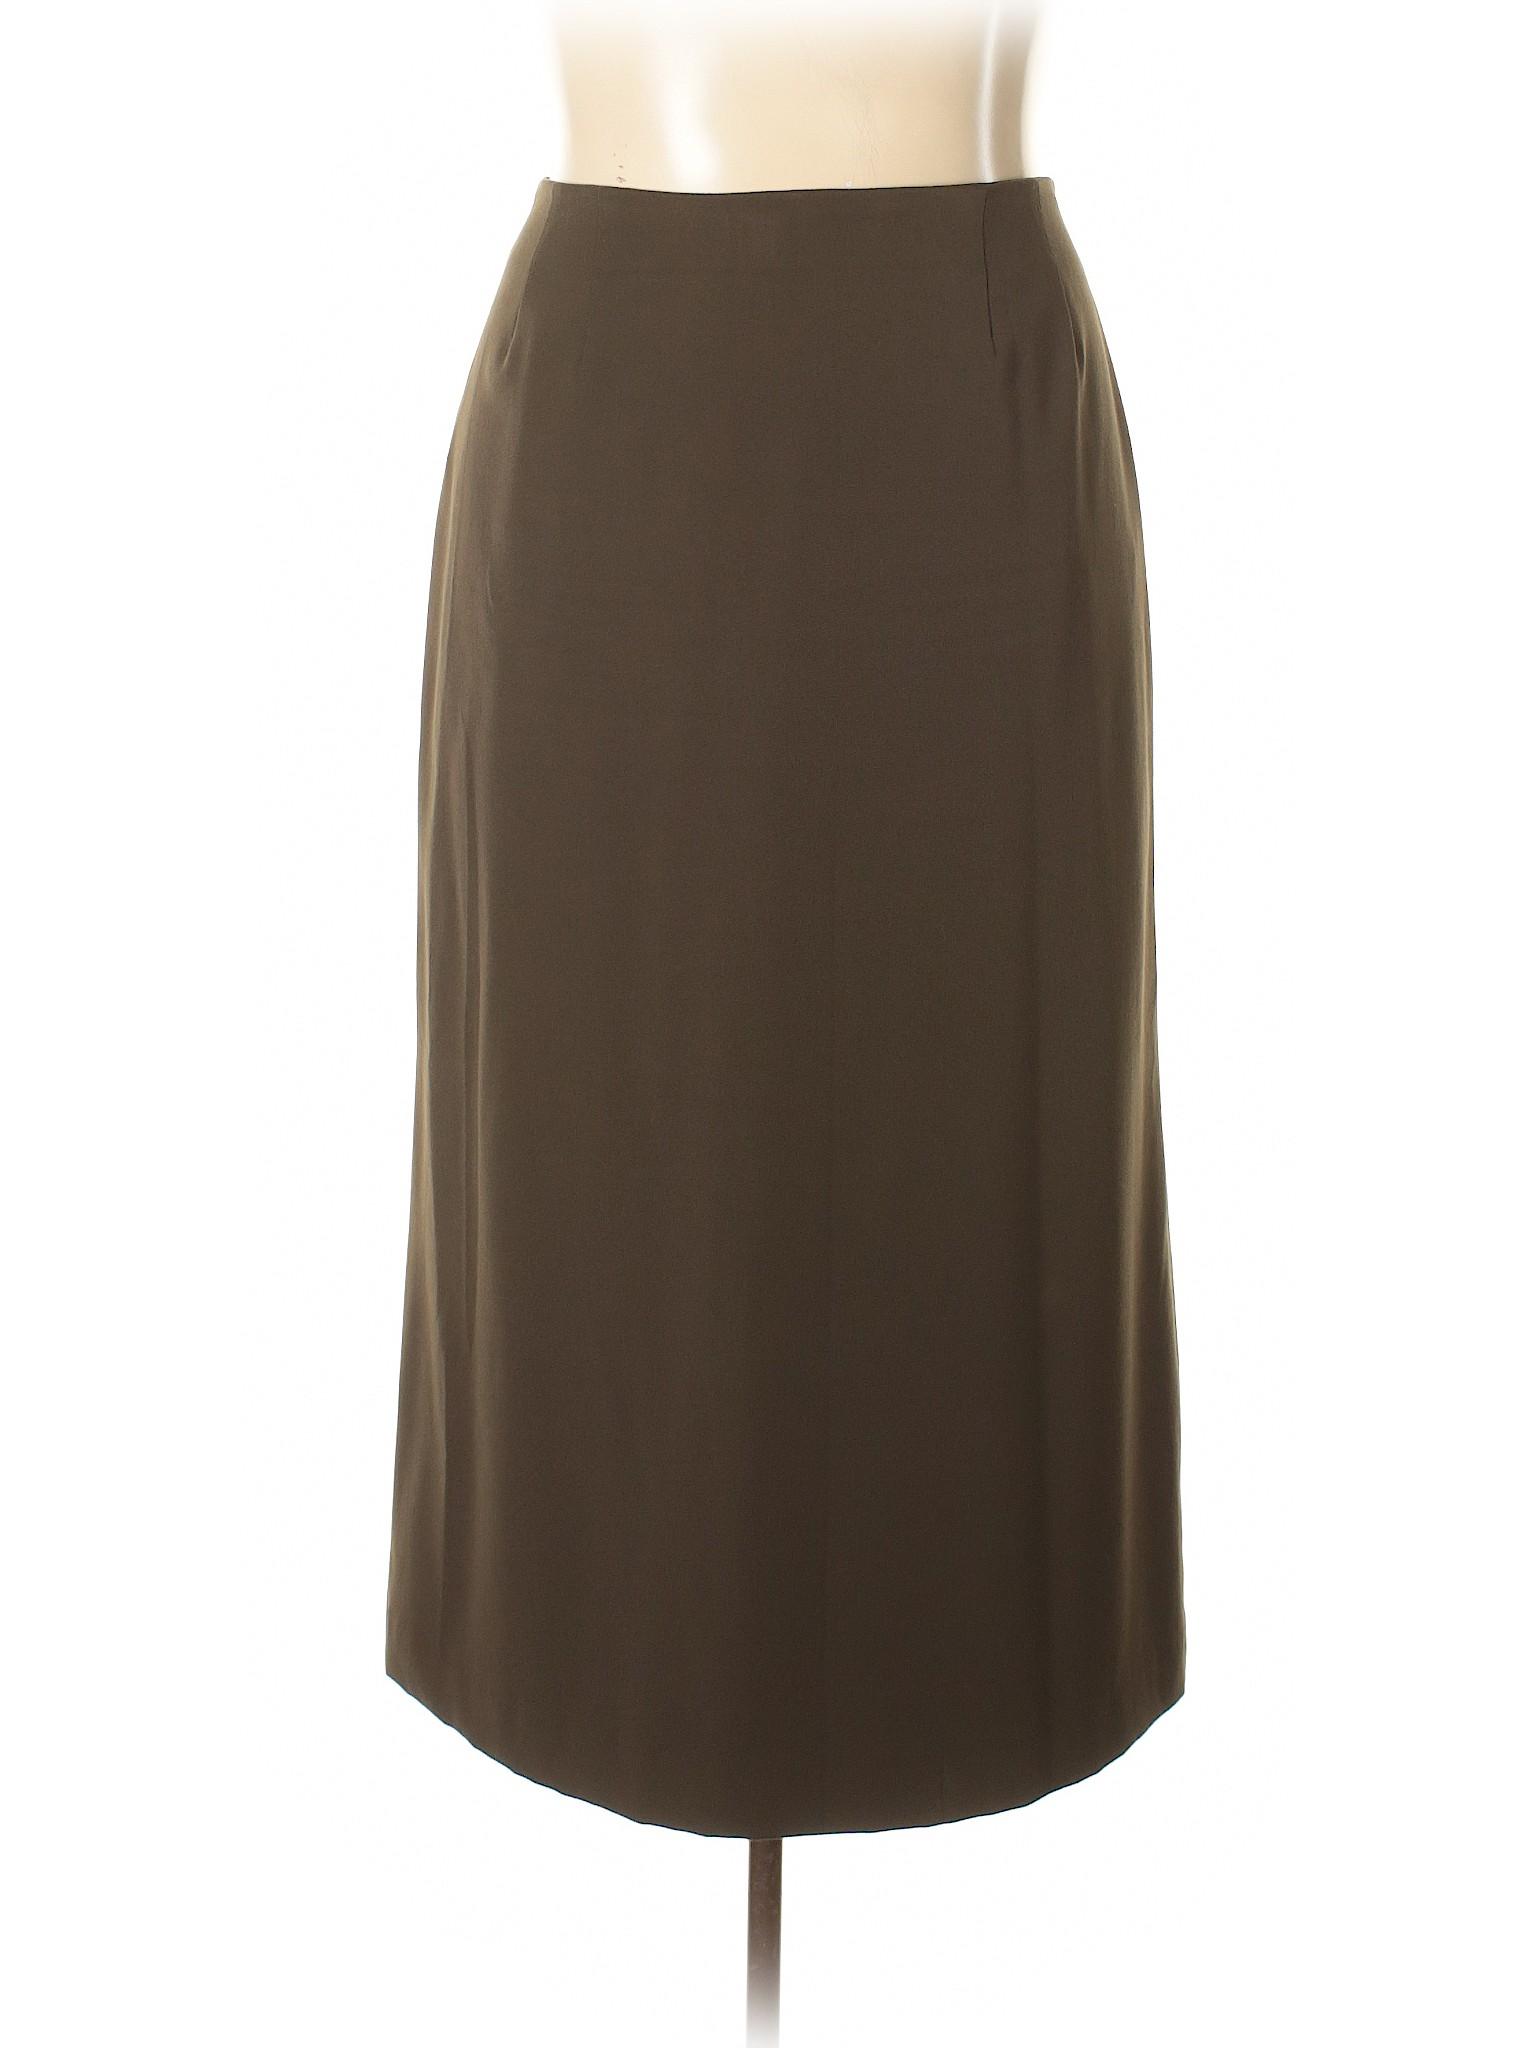 Boutique Casual Casual Boutique Skirt q15RICwx